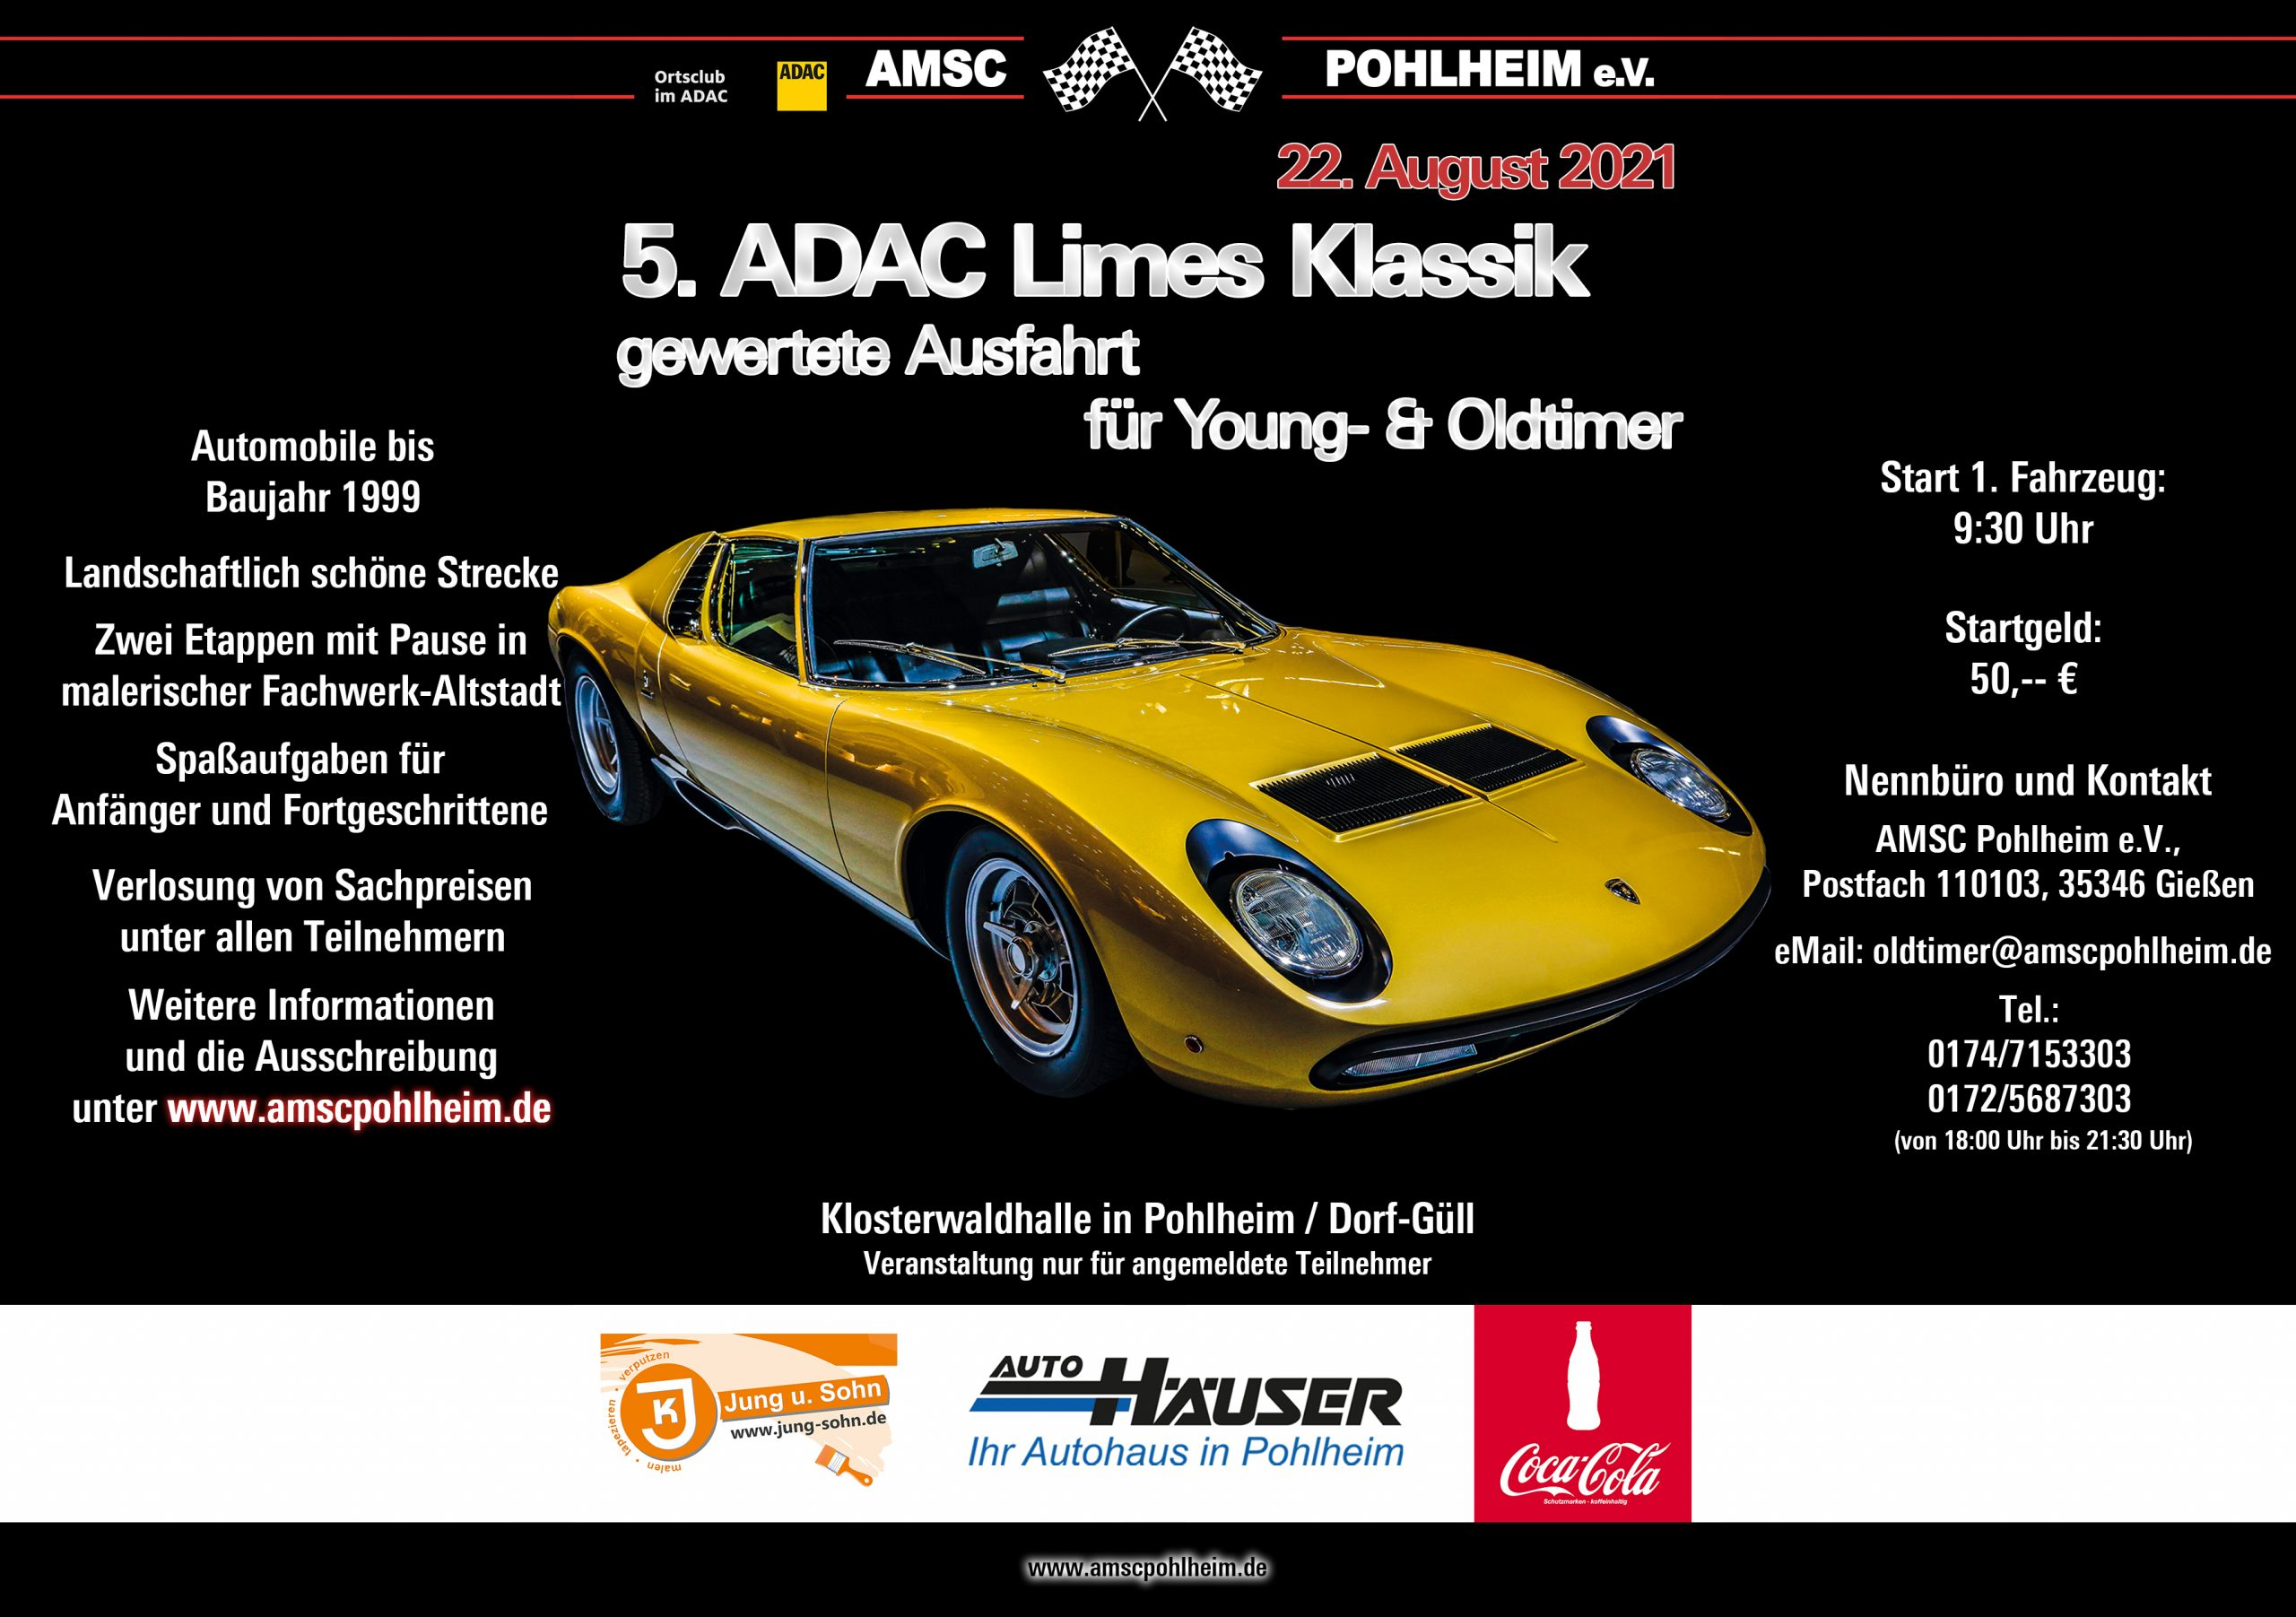 5. ADAC Limes Klassik Online Flyer